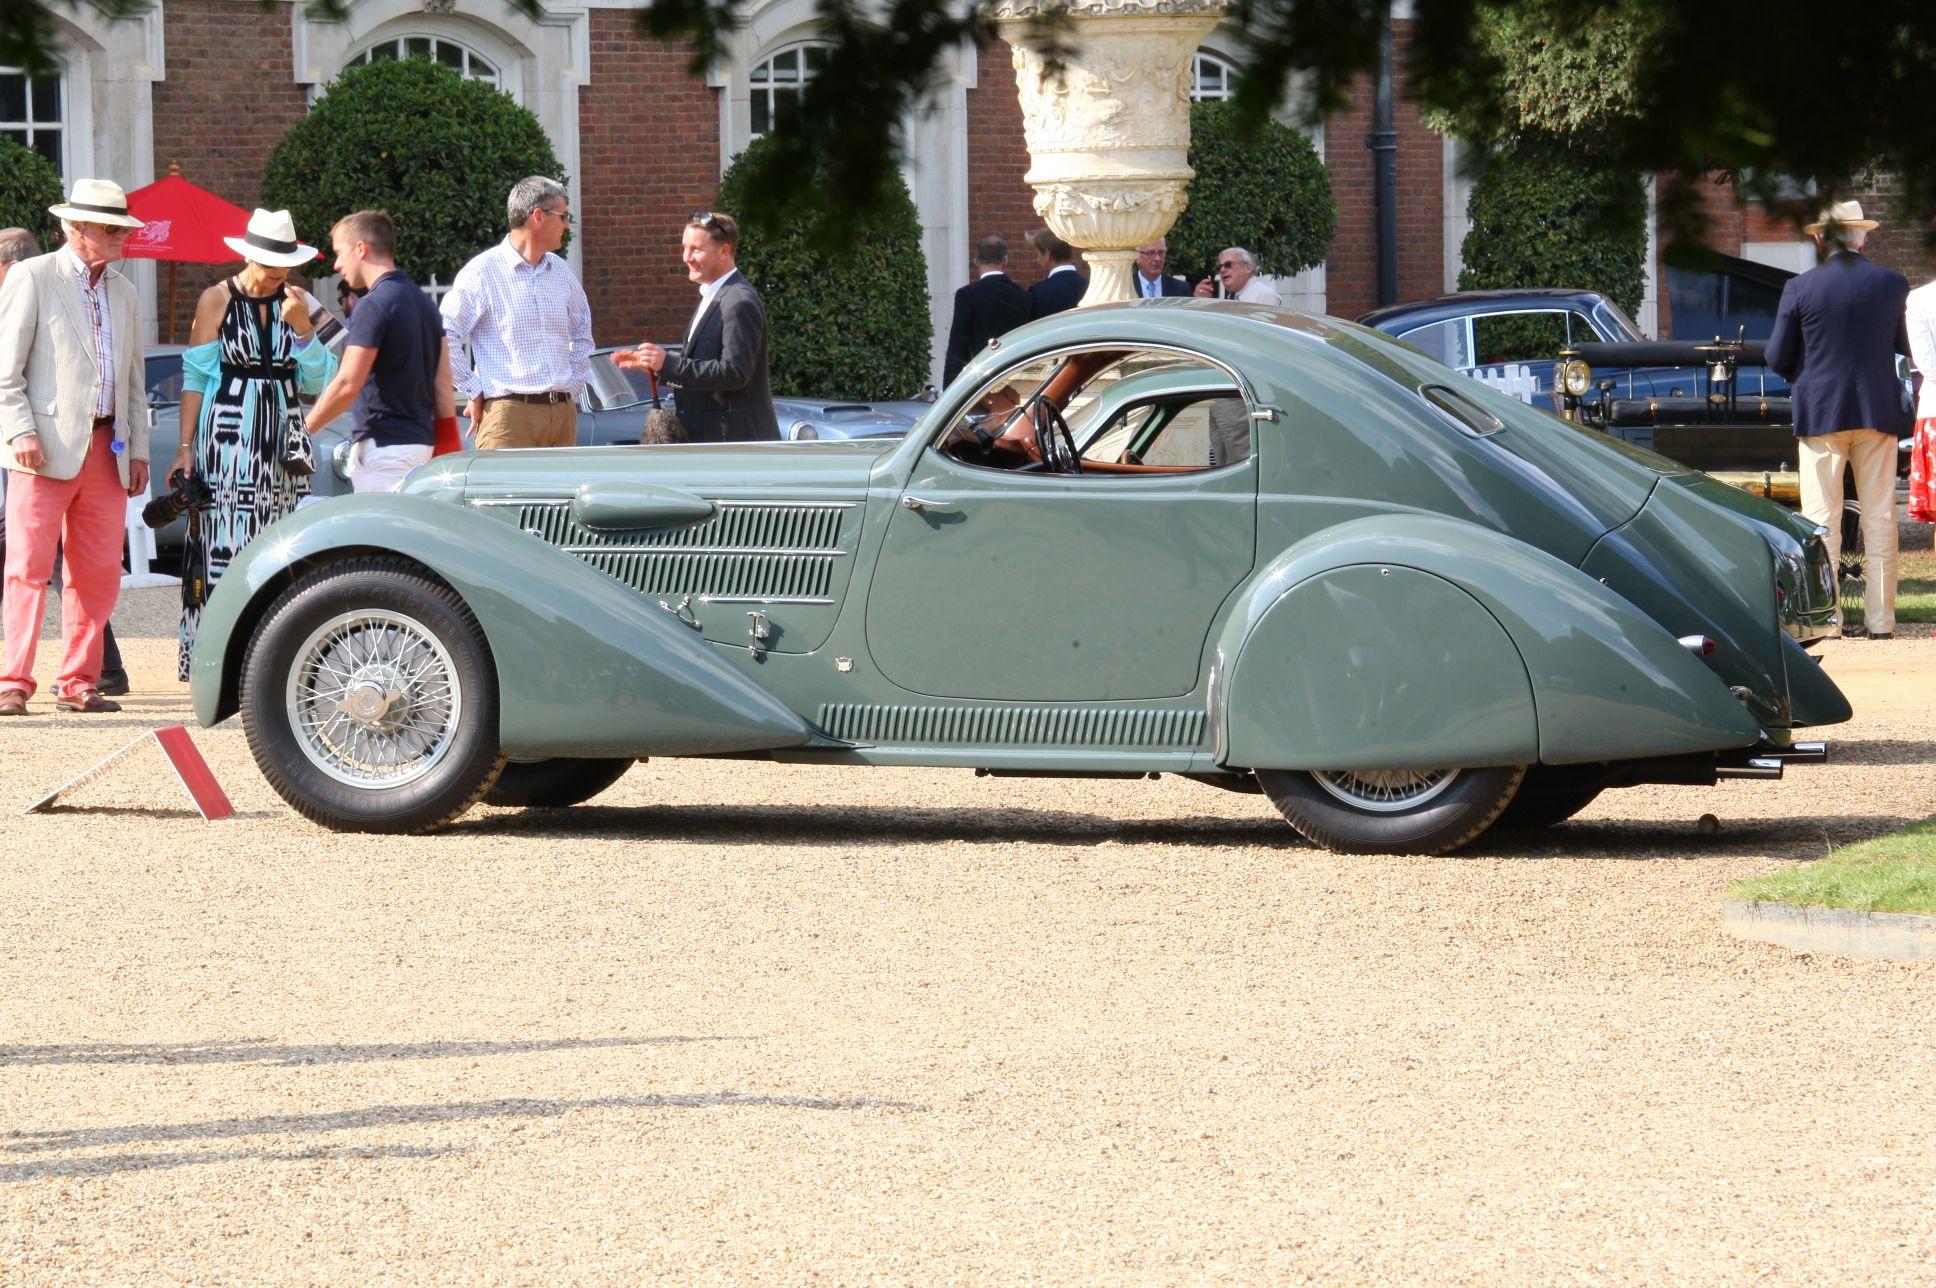 1933/35 Lancia Astura Aerodinamica Castagna Coupe | Beautiful ...